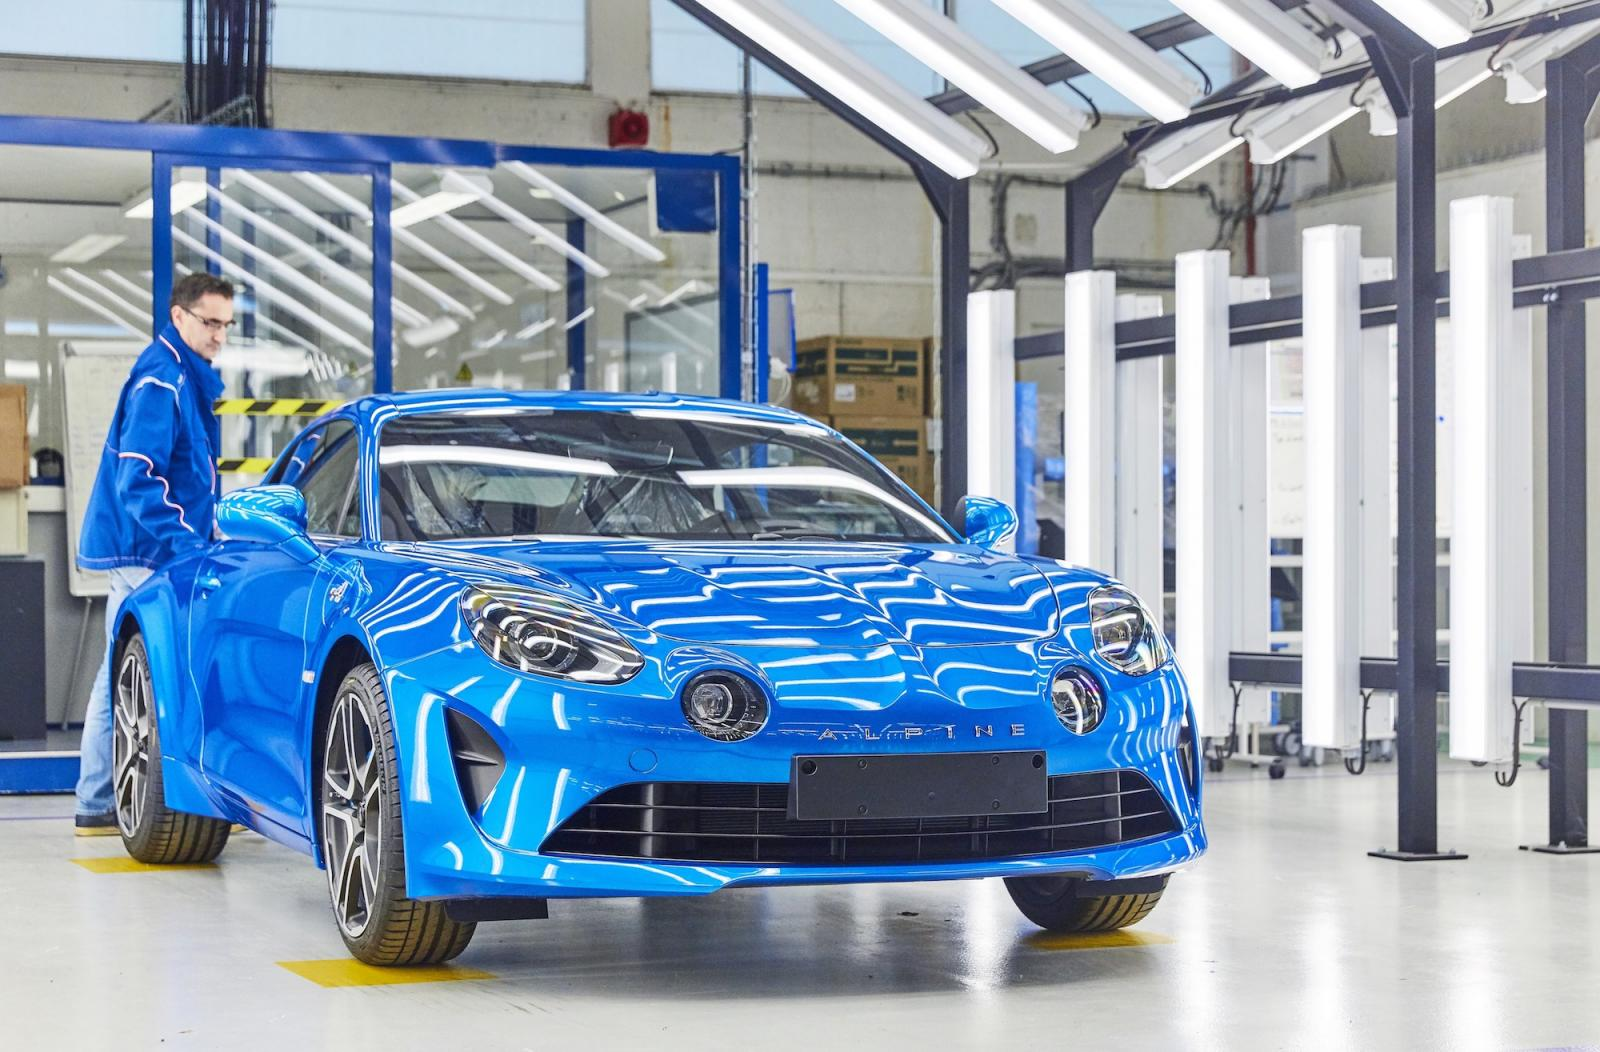 alpine-a110-usine-dieppe-inauguration-2017-1